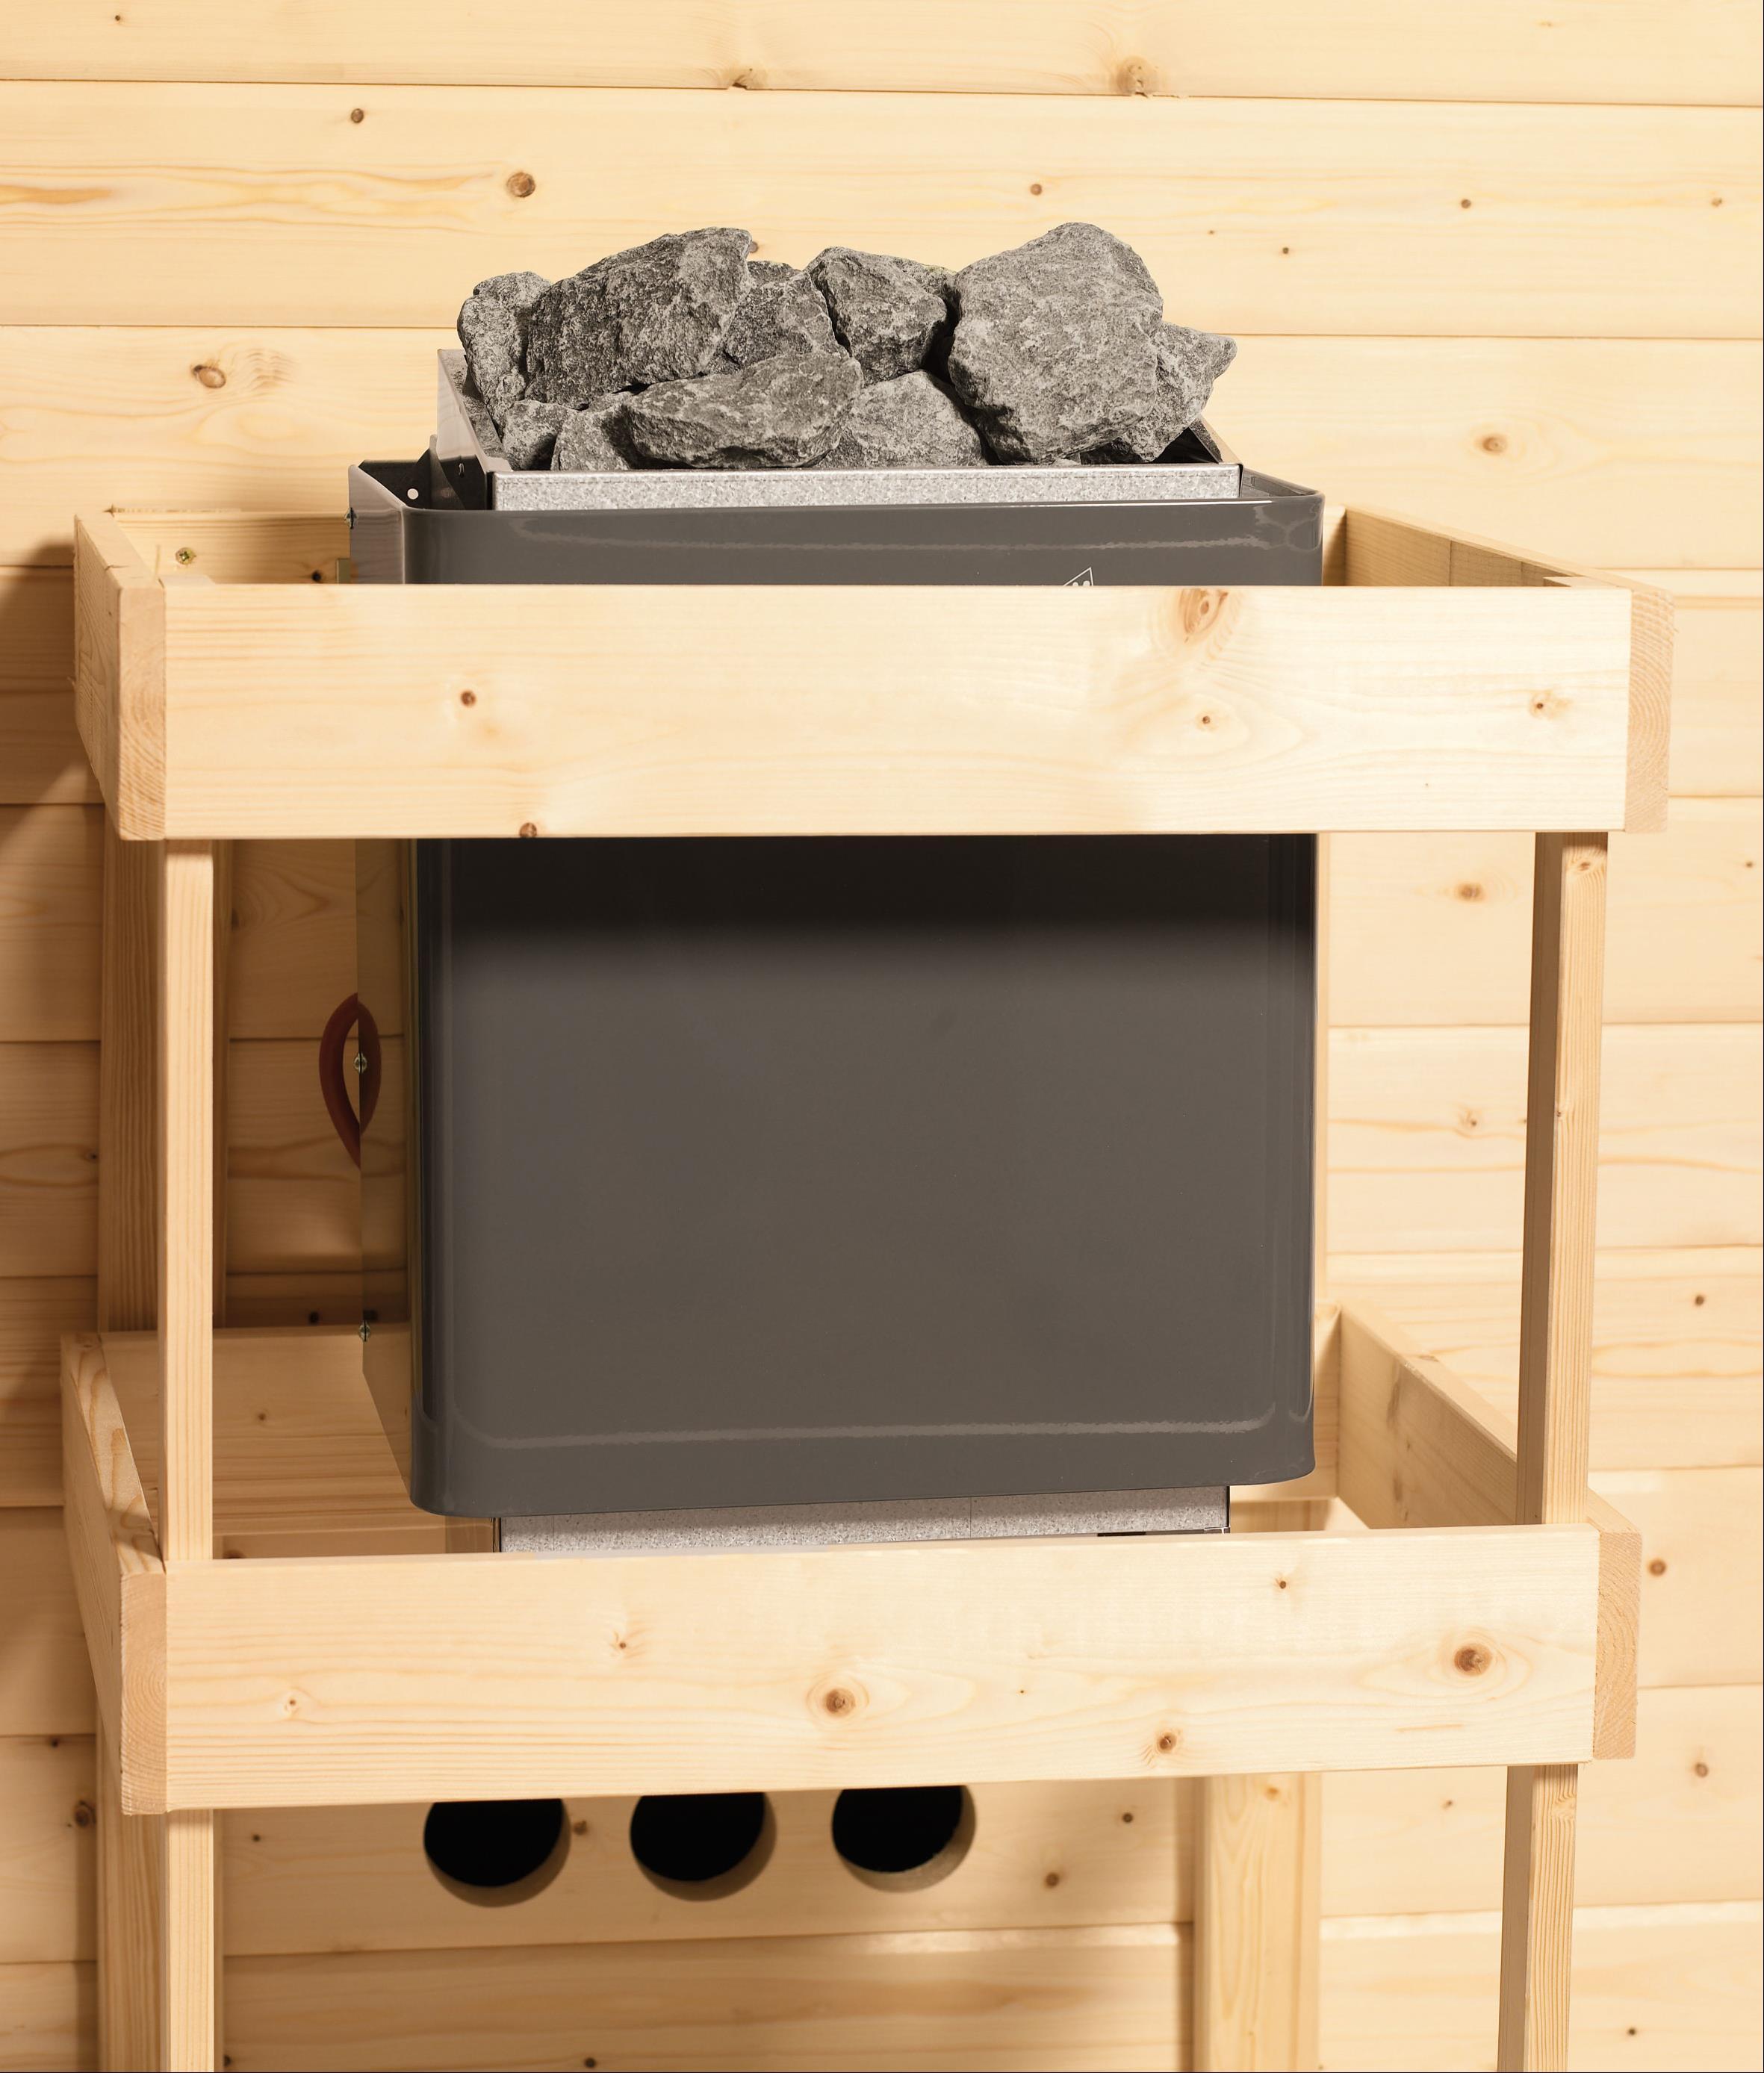 Gartensauna Karibu Saunahaus Hygge grau 38mm Saunaofen 9kW Bio extern Bild 8